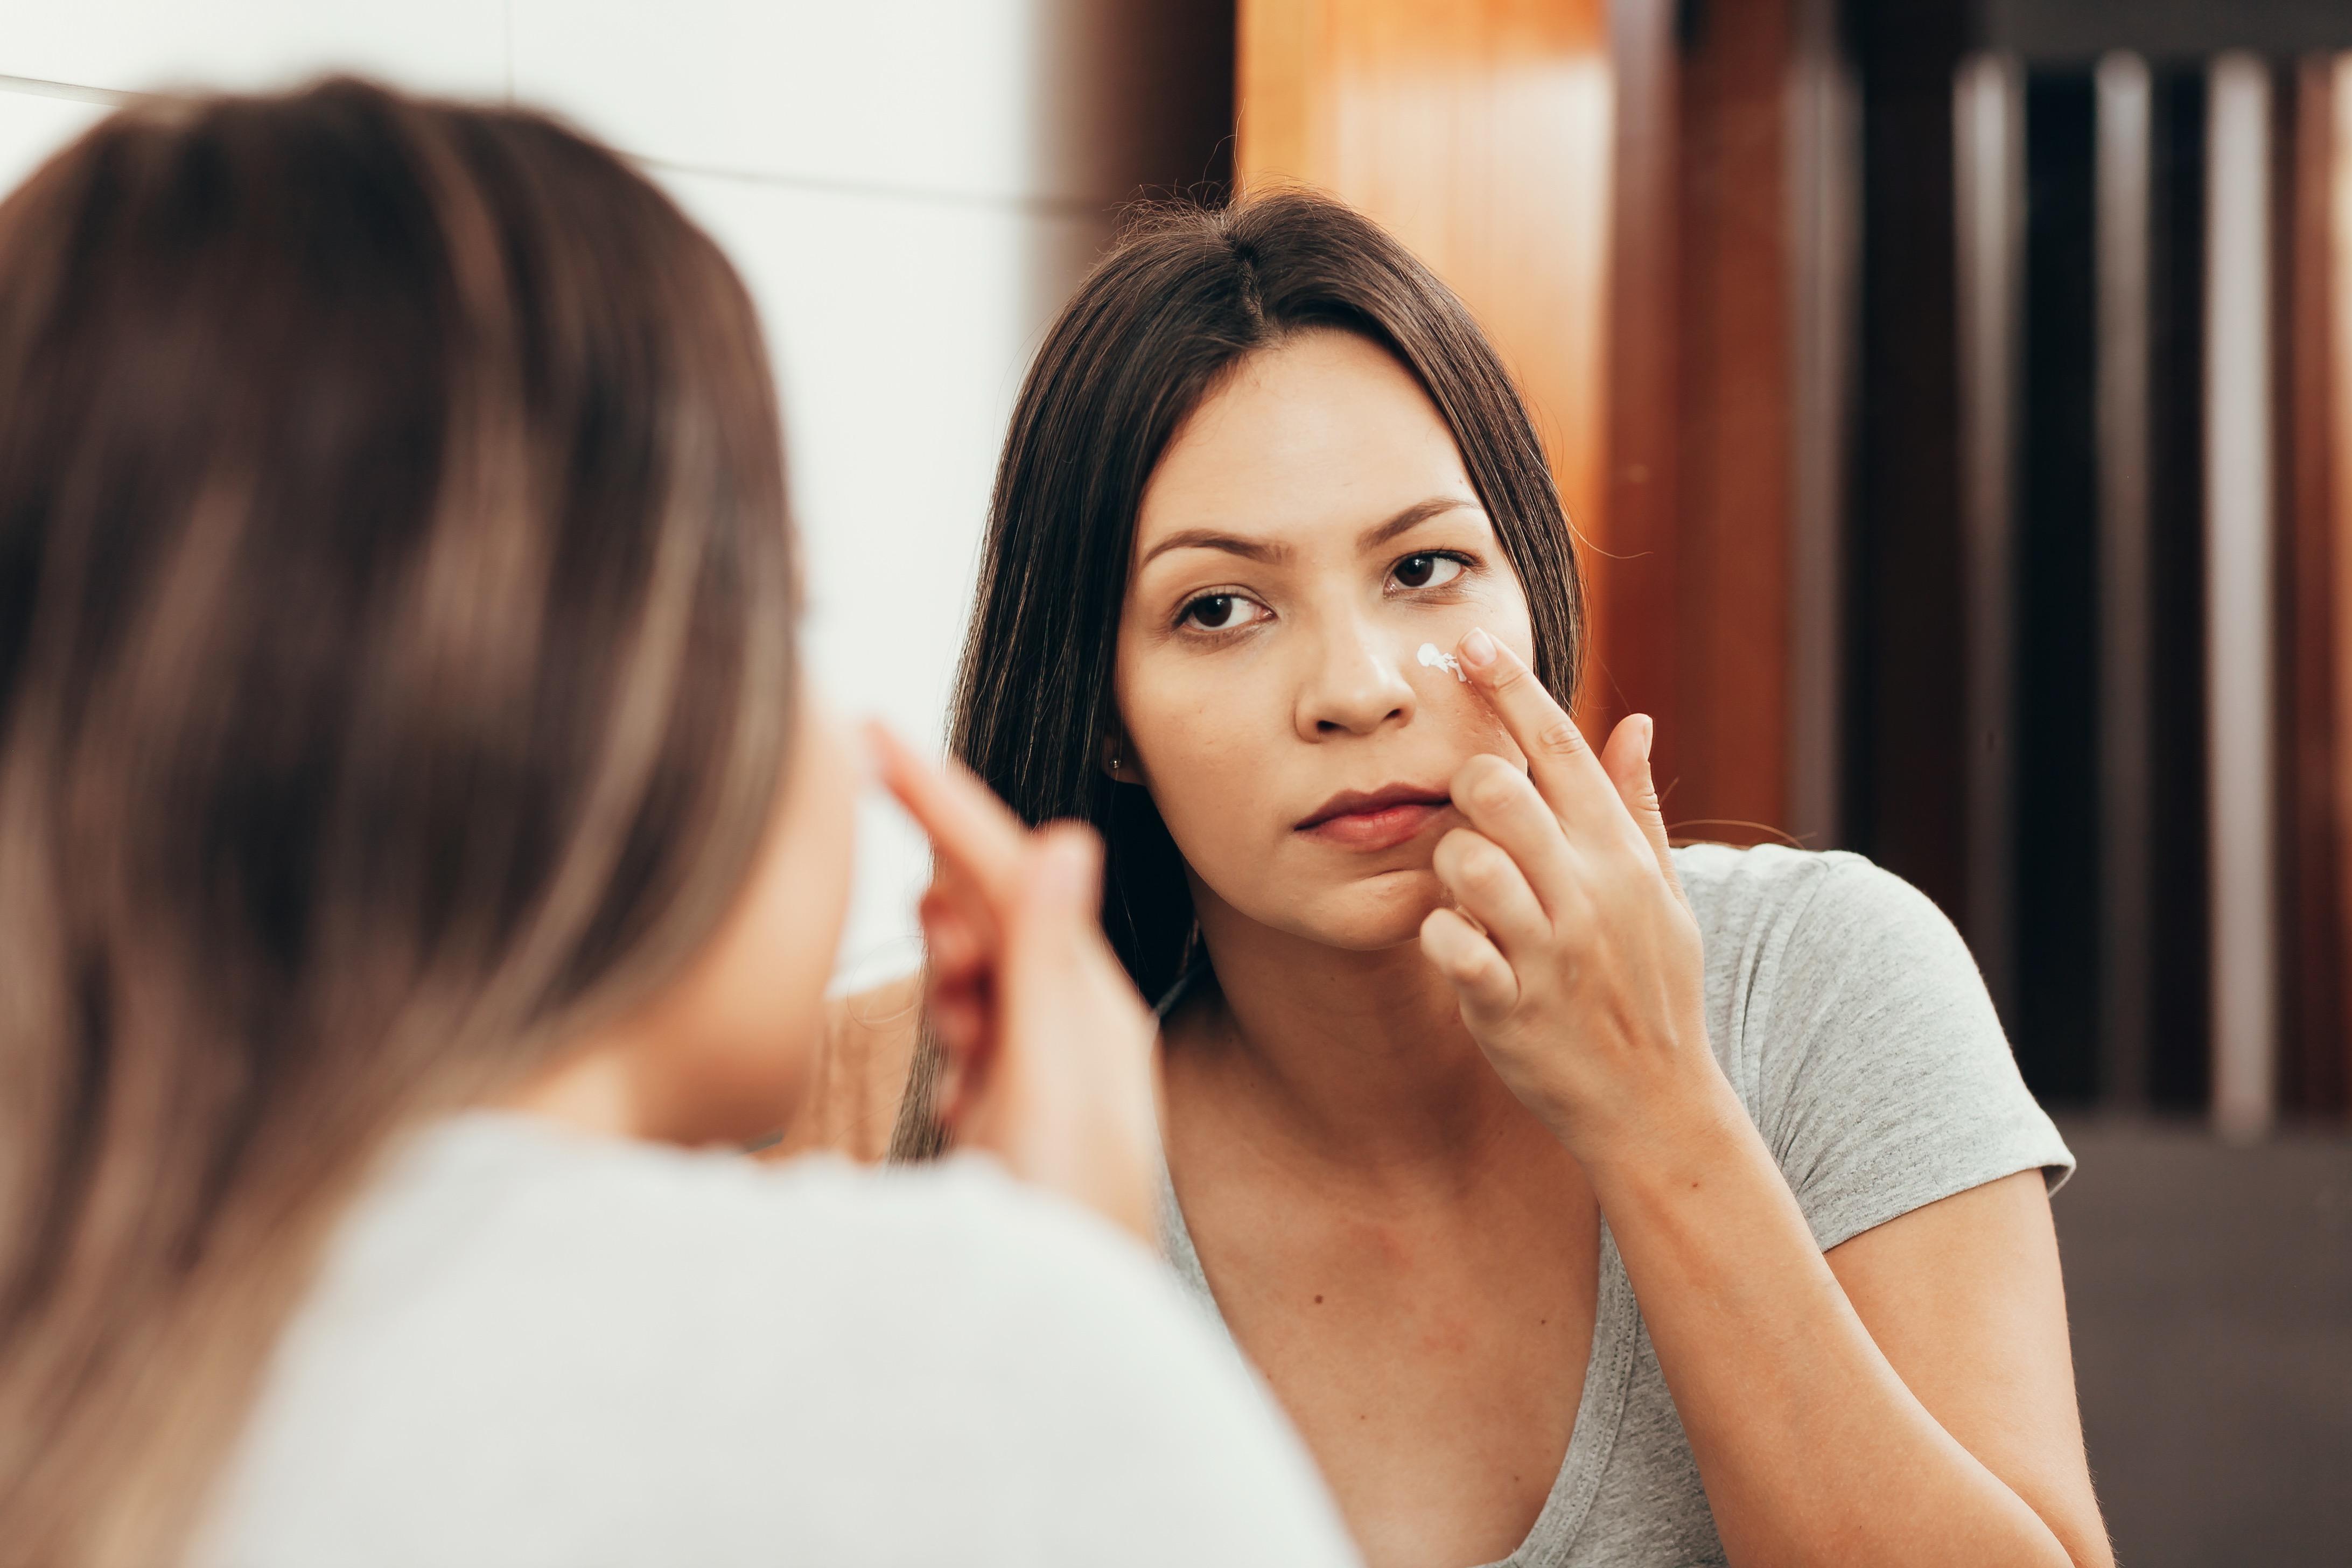 Skin-Lightening Cream Leaves Woman Semi-Comatose